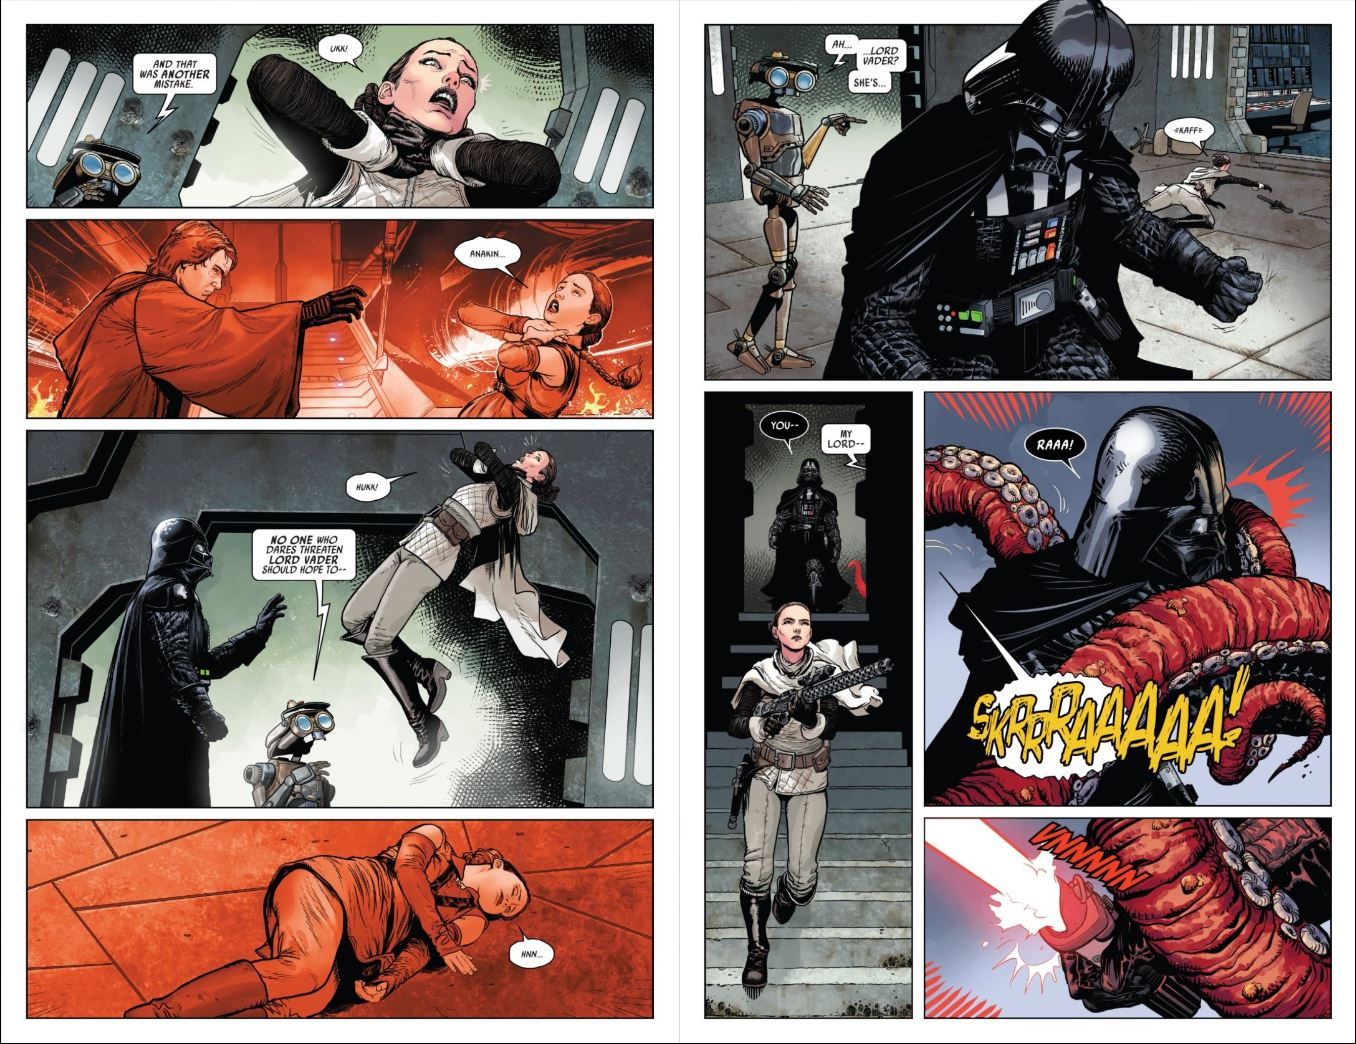 Review Issue 2 Star Wars Darth Vader (2020) - Vader strangling Padme and Sabe